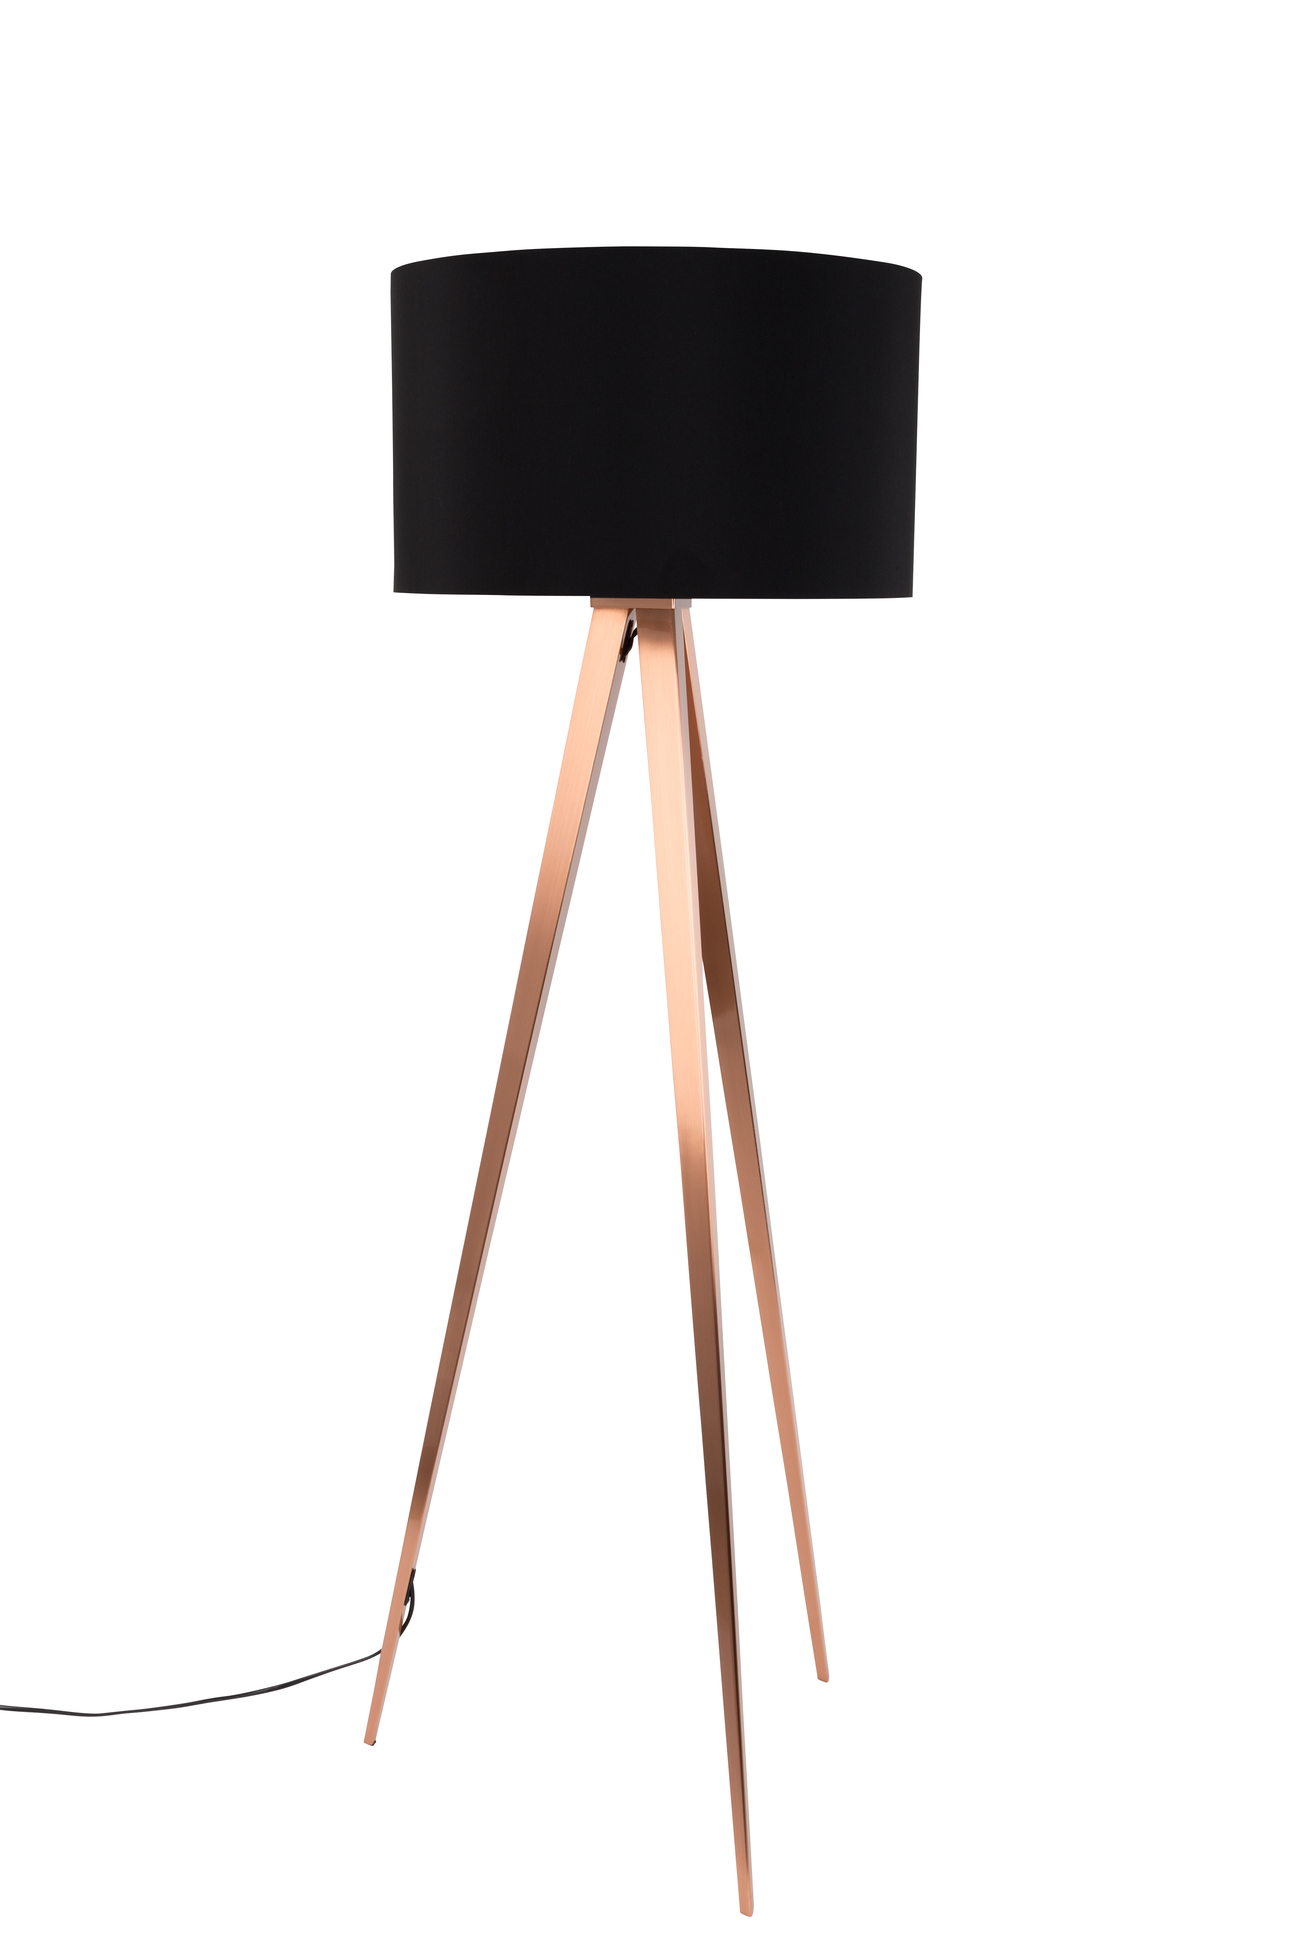 zuiver vloerlamp tripod h157 cm zwart grijze lampenkap aanbieding kopen. Black Bedroom Furniture Sets. Home Design Ideas